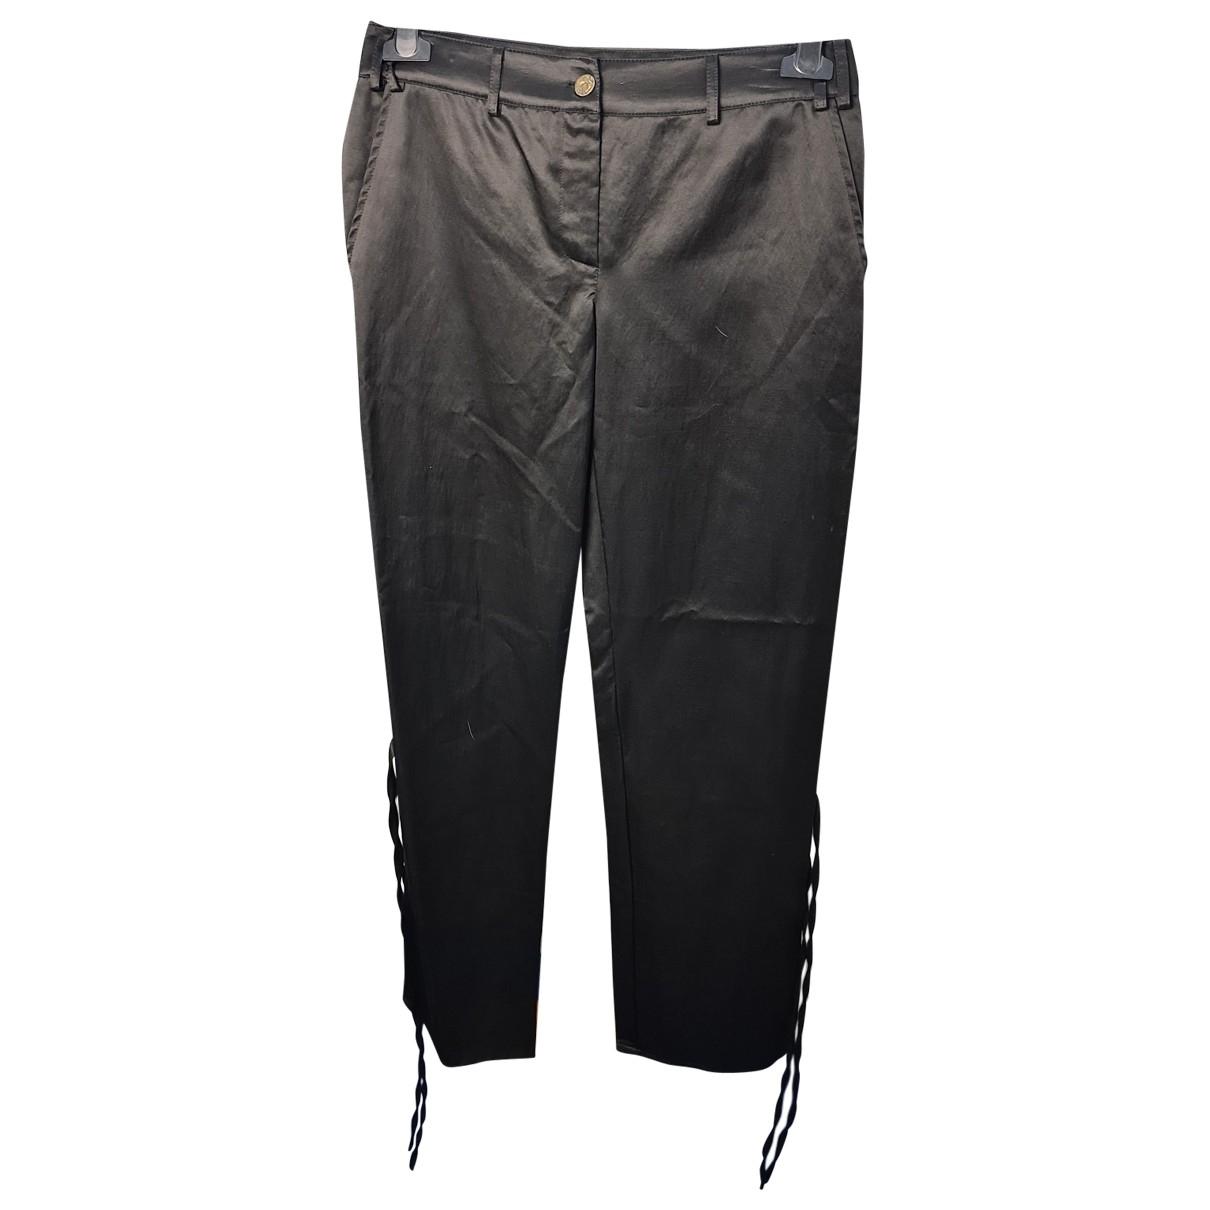 Pantalon en Algodon Negro Class Cavalli